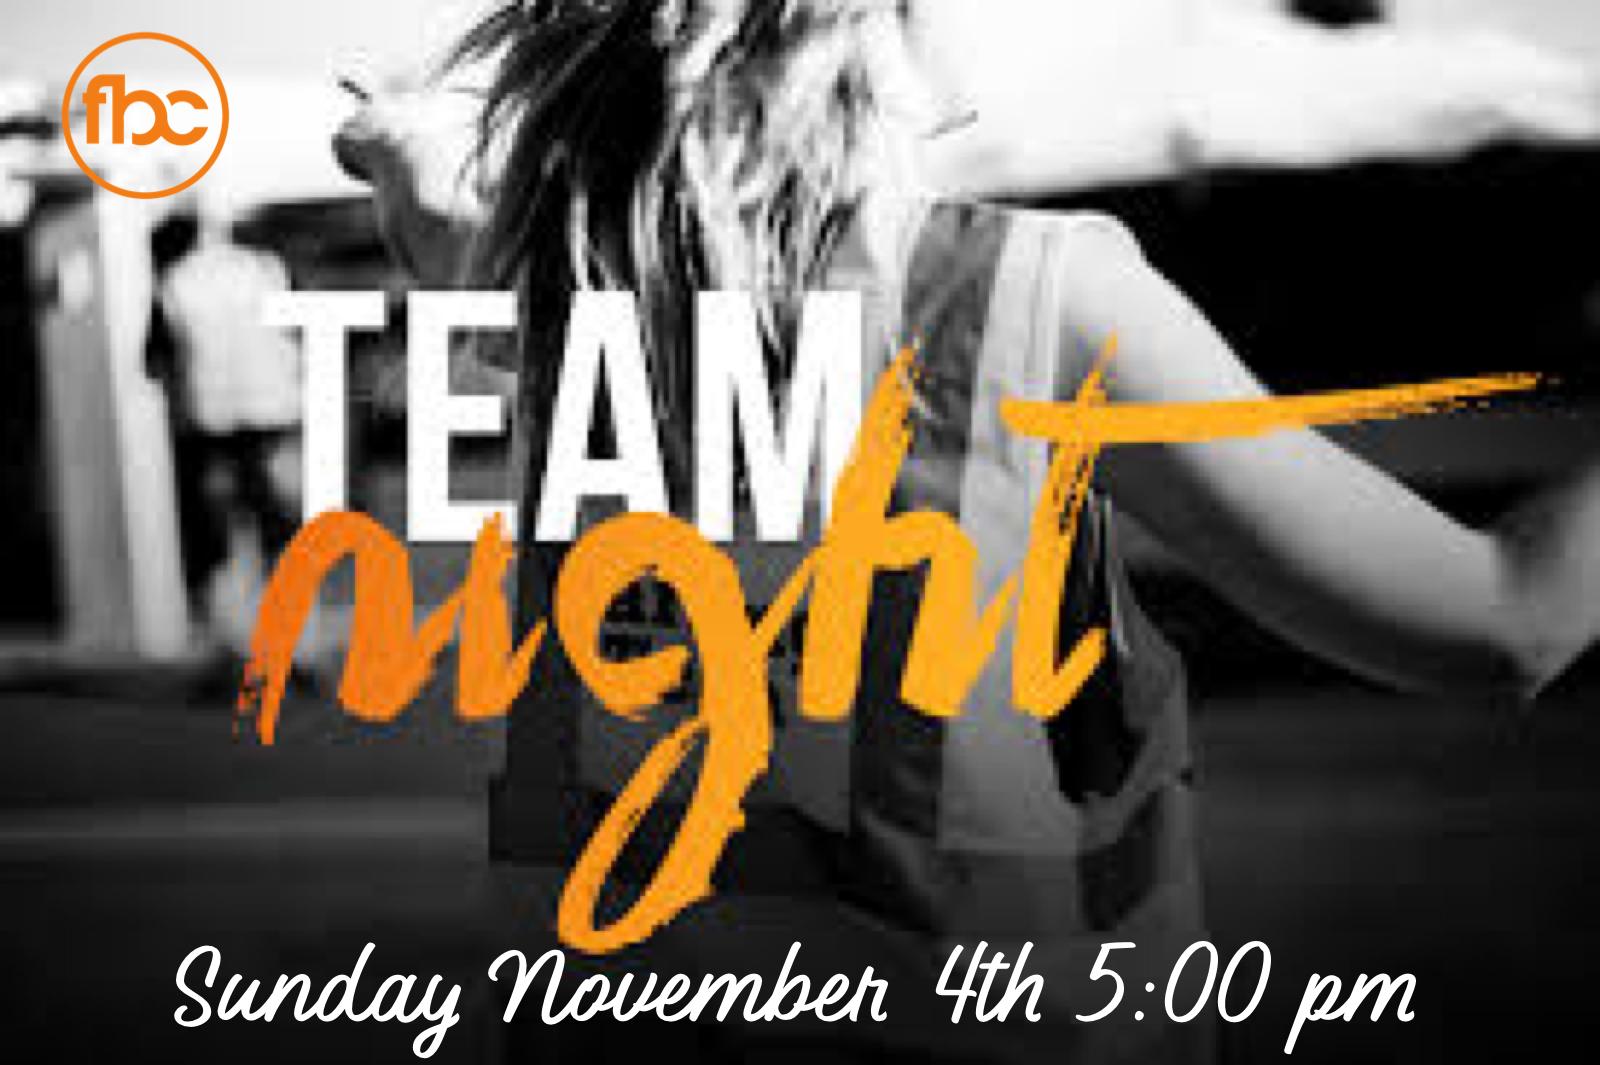 Team Night - Sunday, November 4th at 5:00 pm